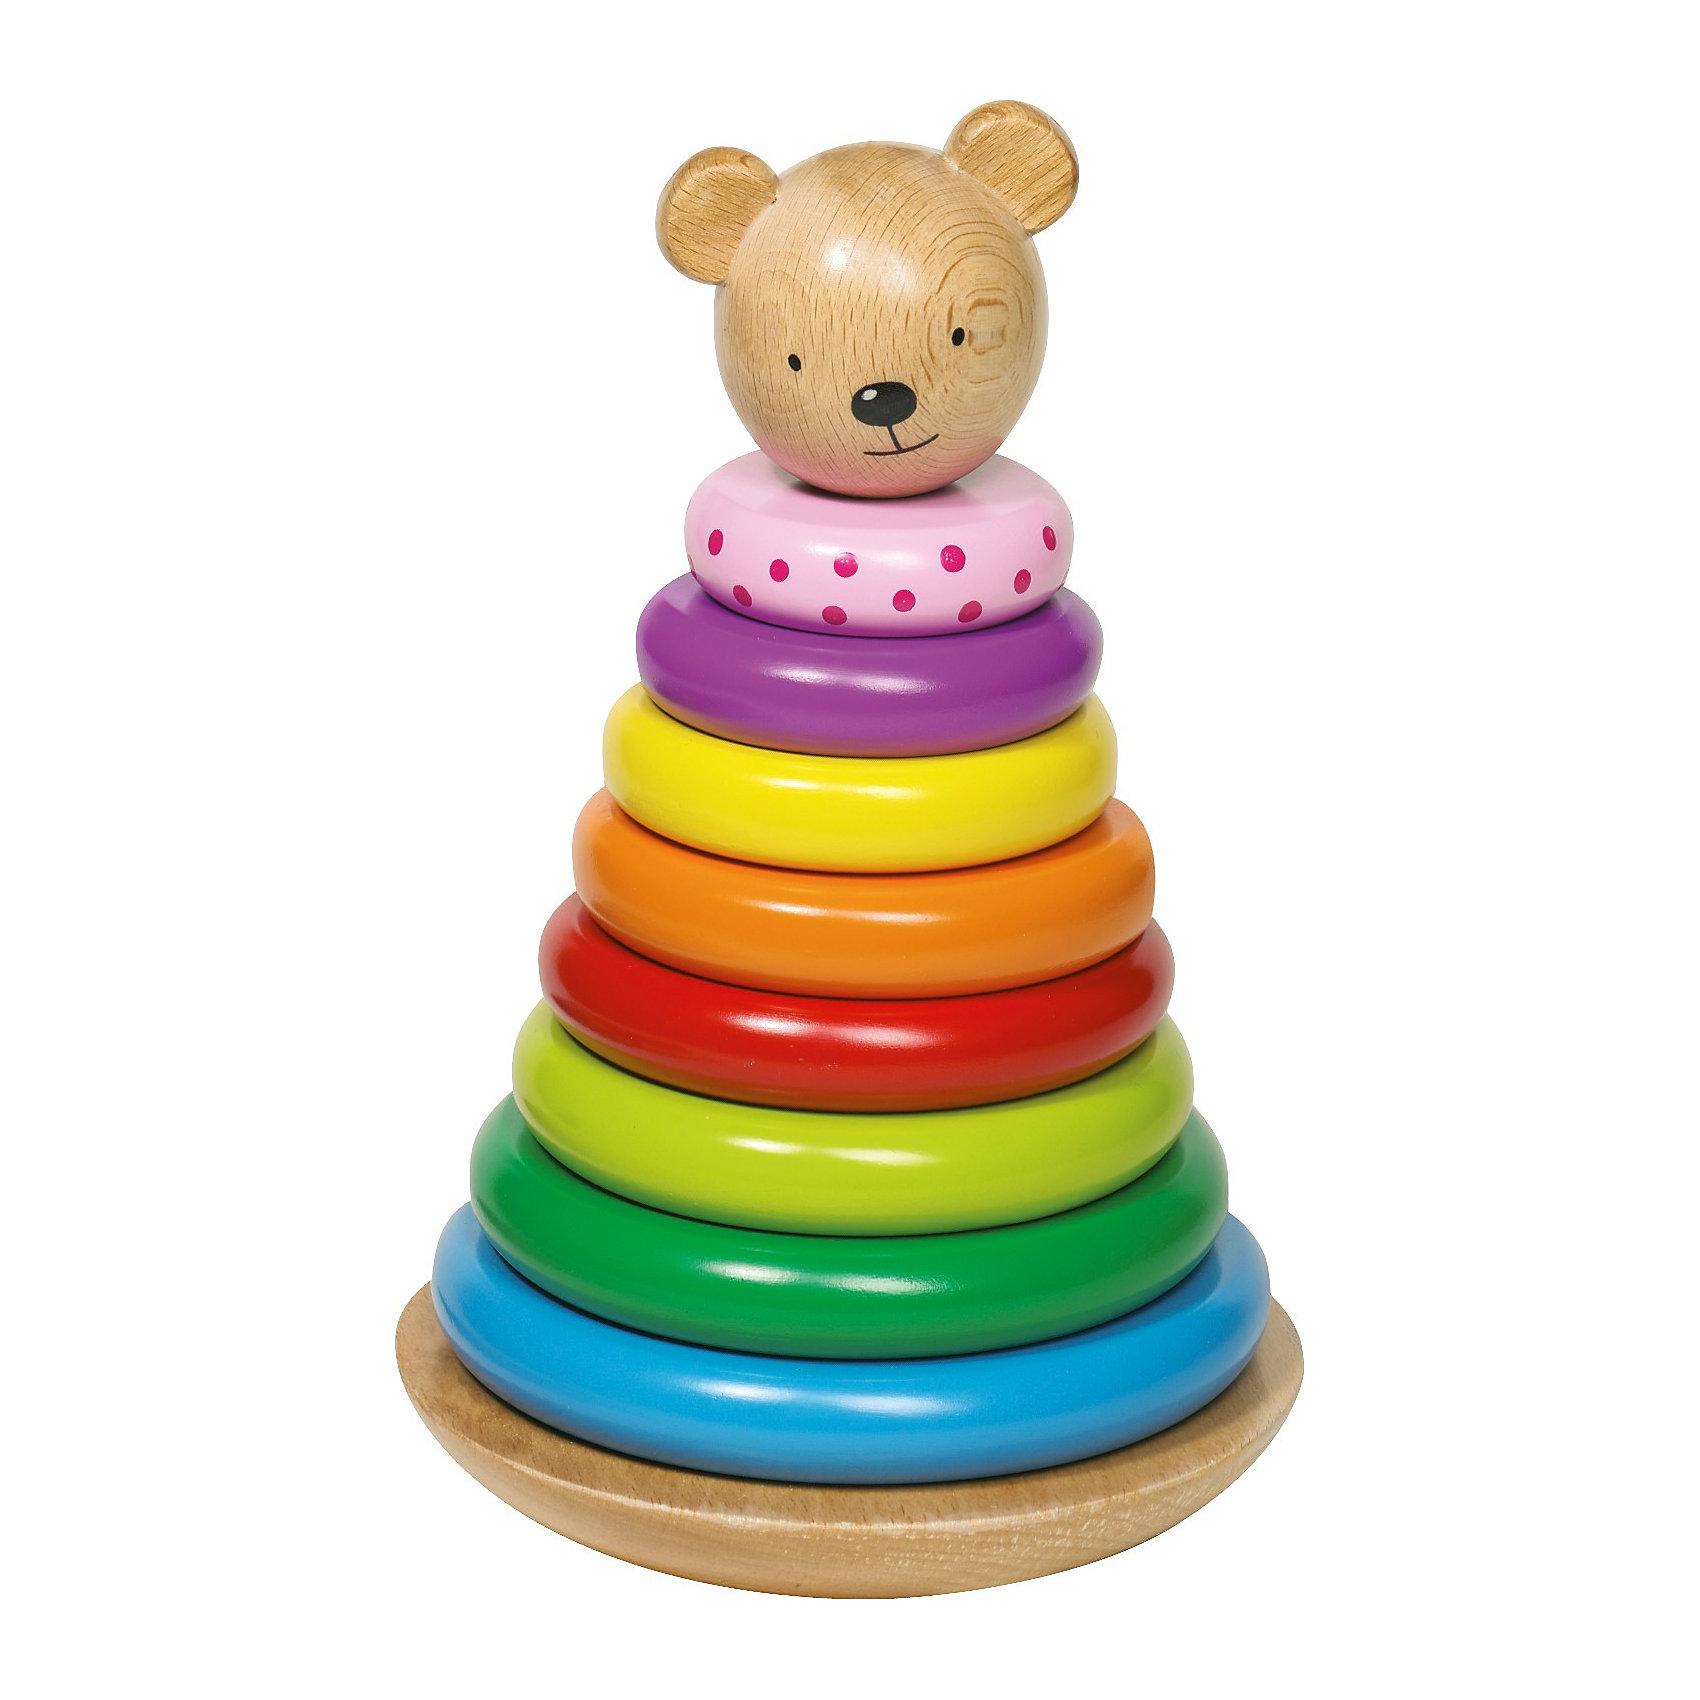 goki Пирамидка Мишка, goki игрушка пирамидка мишка топтыжка